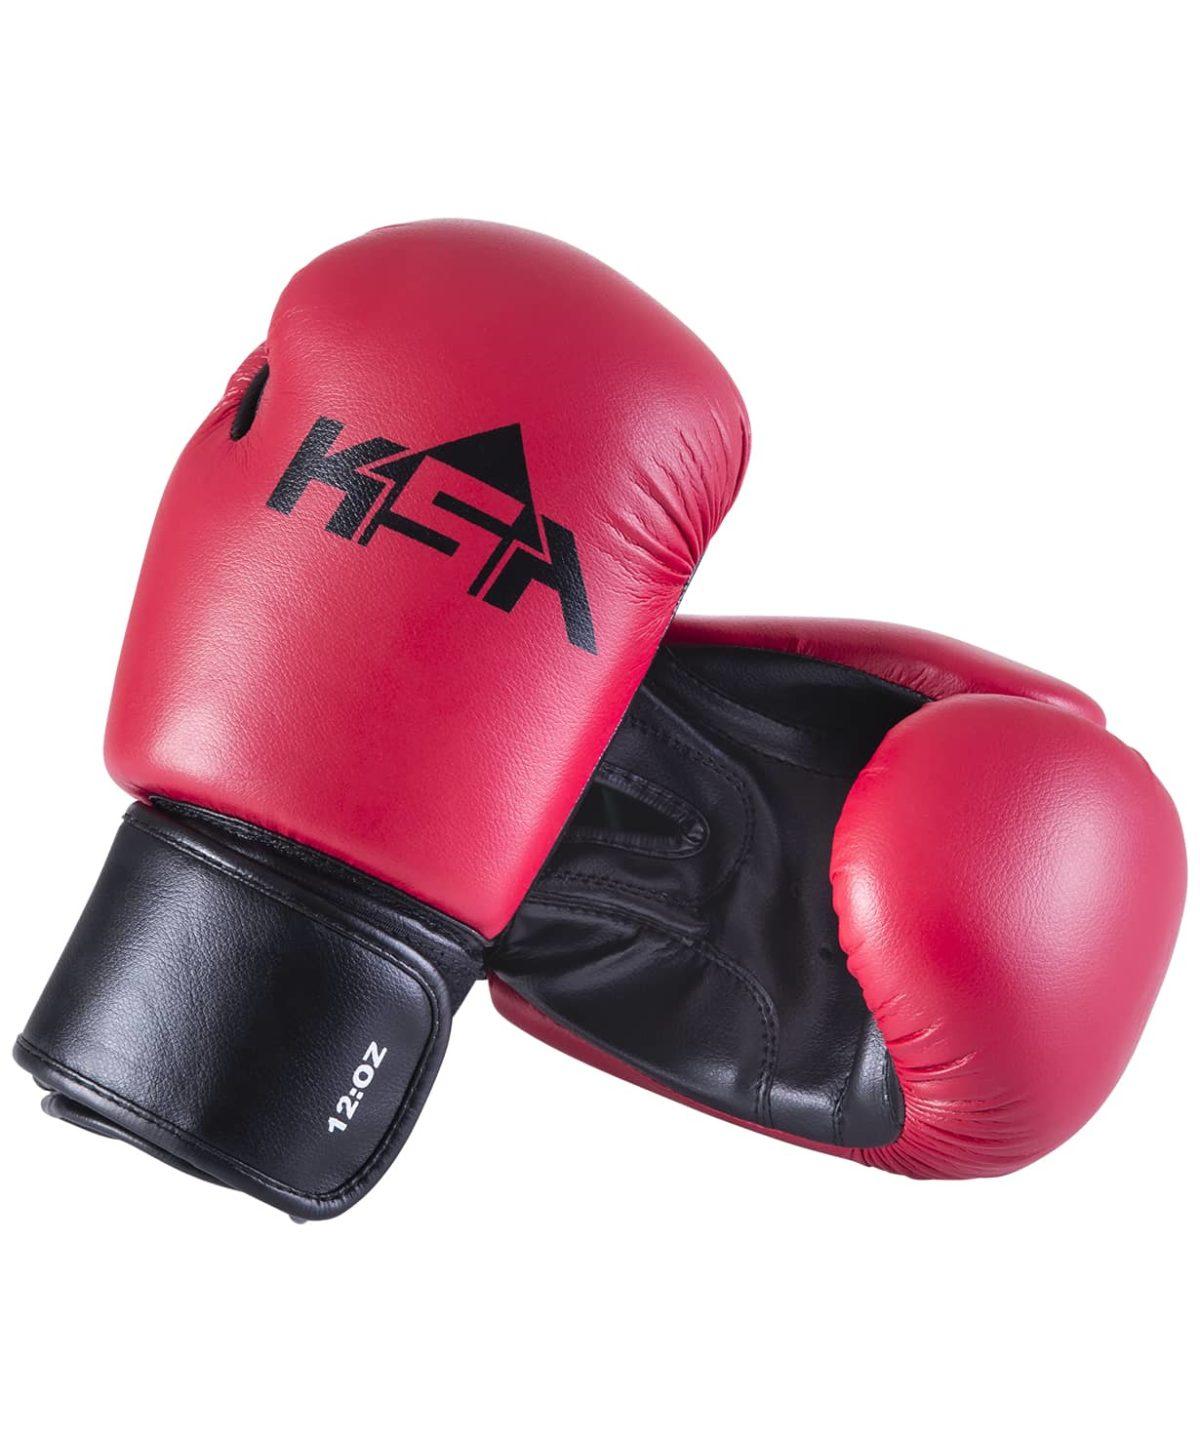 KSA Spider Red Перчатки боксерские, 10 oz, к/з  17812 - 1